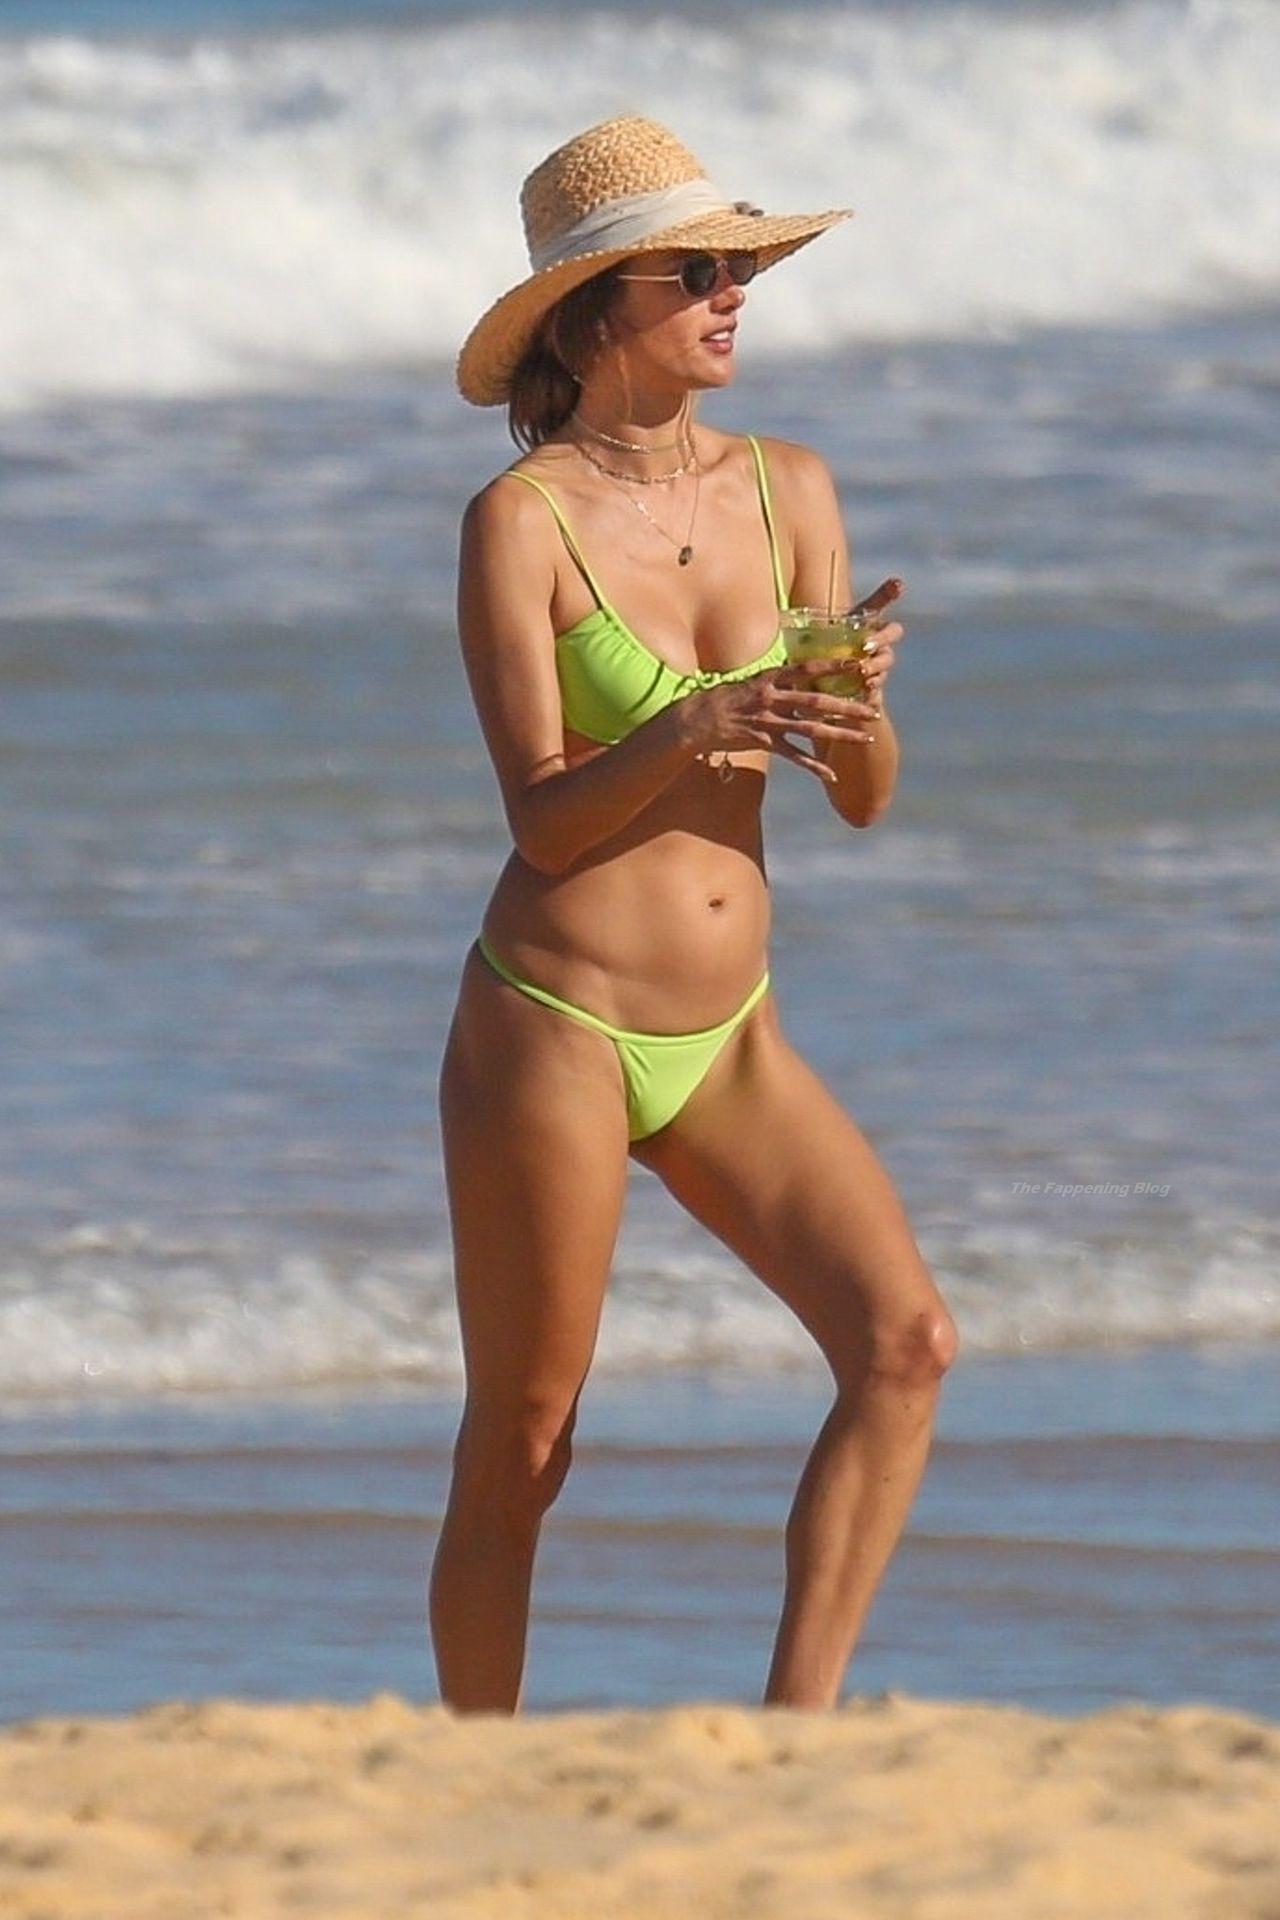 Alessandra-Ambrosio-Sexy-The-Fappening-Blog-251.jpg